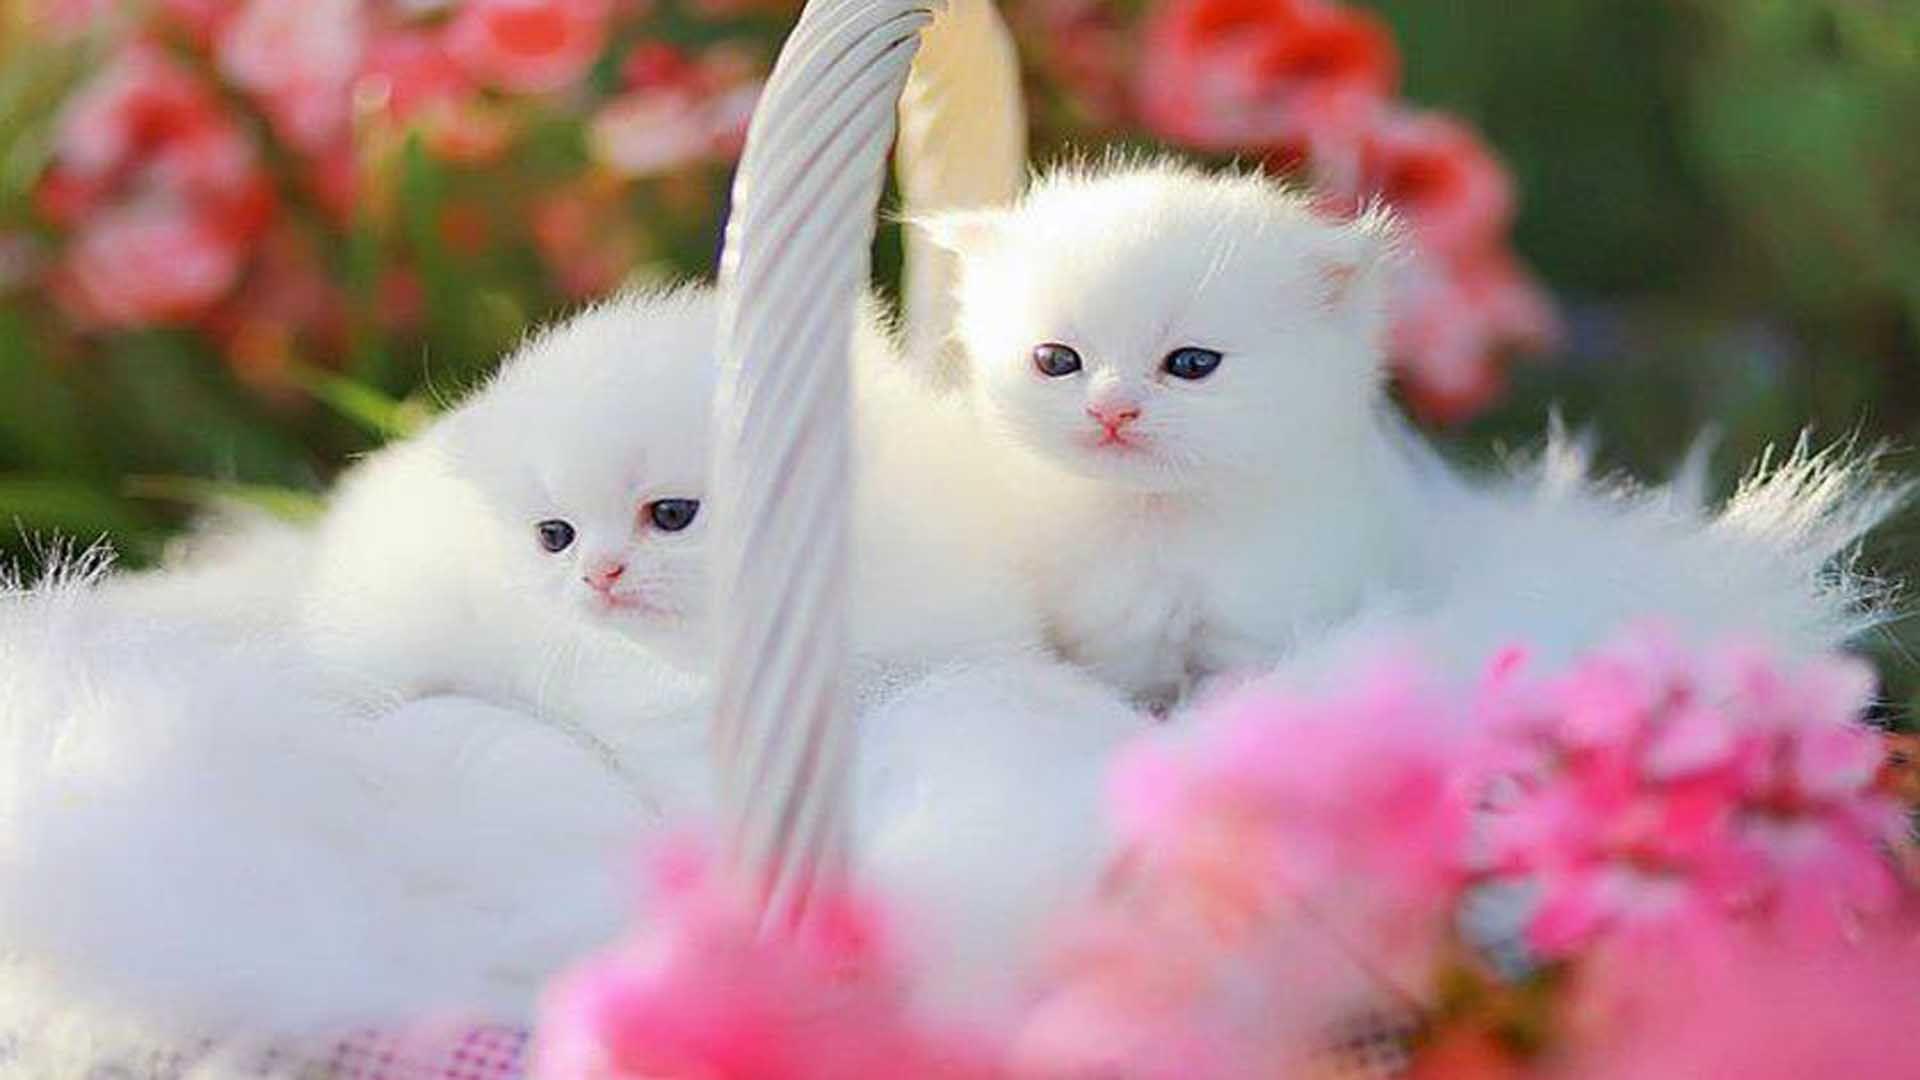 Cute kitten wallpapers top free cute kitten backgrounds - Cute kittens hd images ...